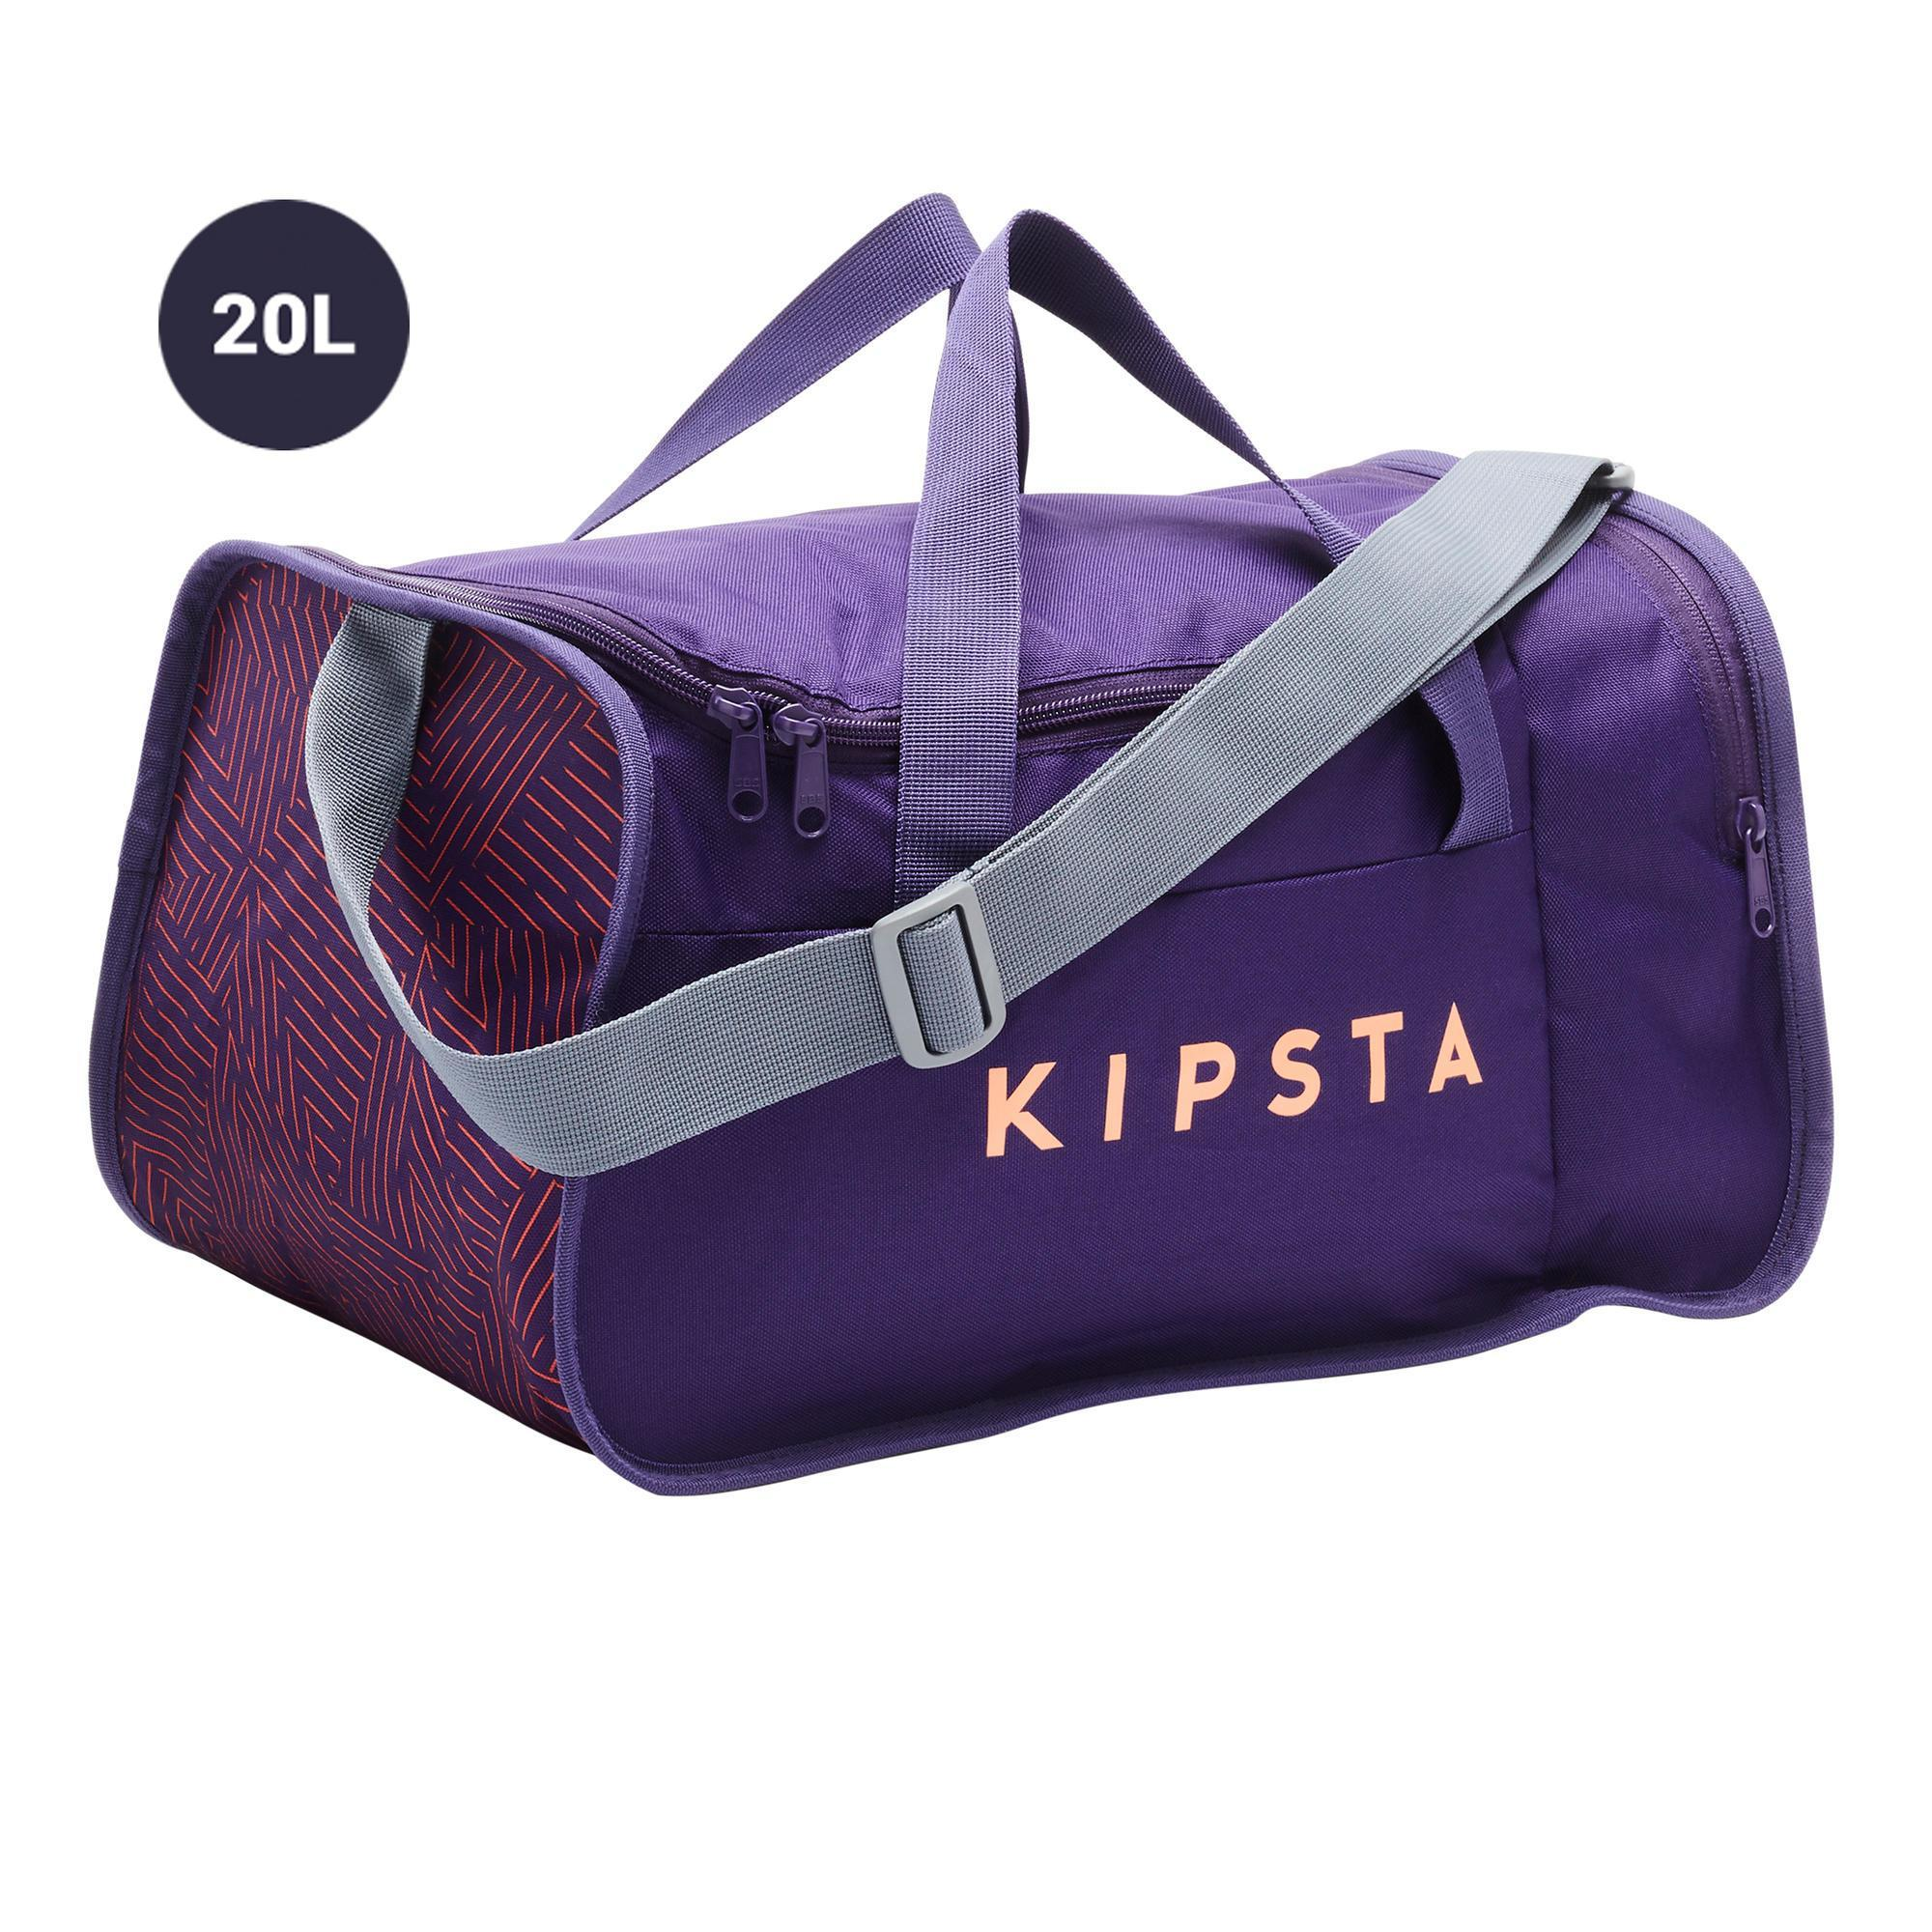 Sporttasche Kipocket 20 l violett/koralle